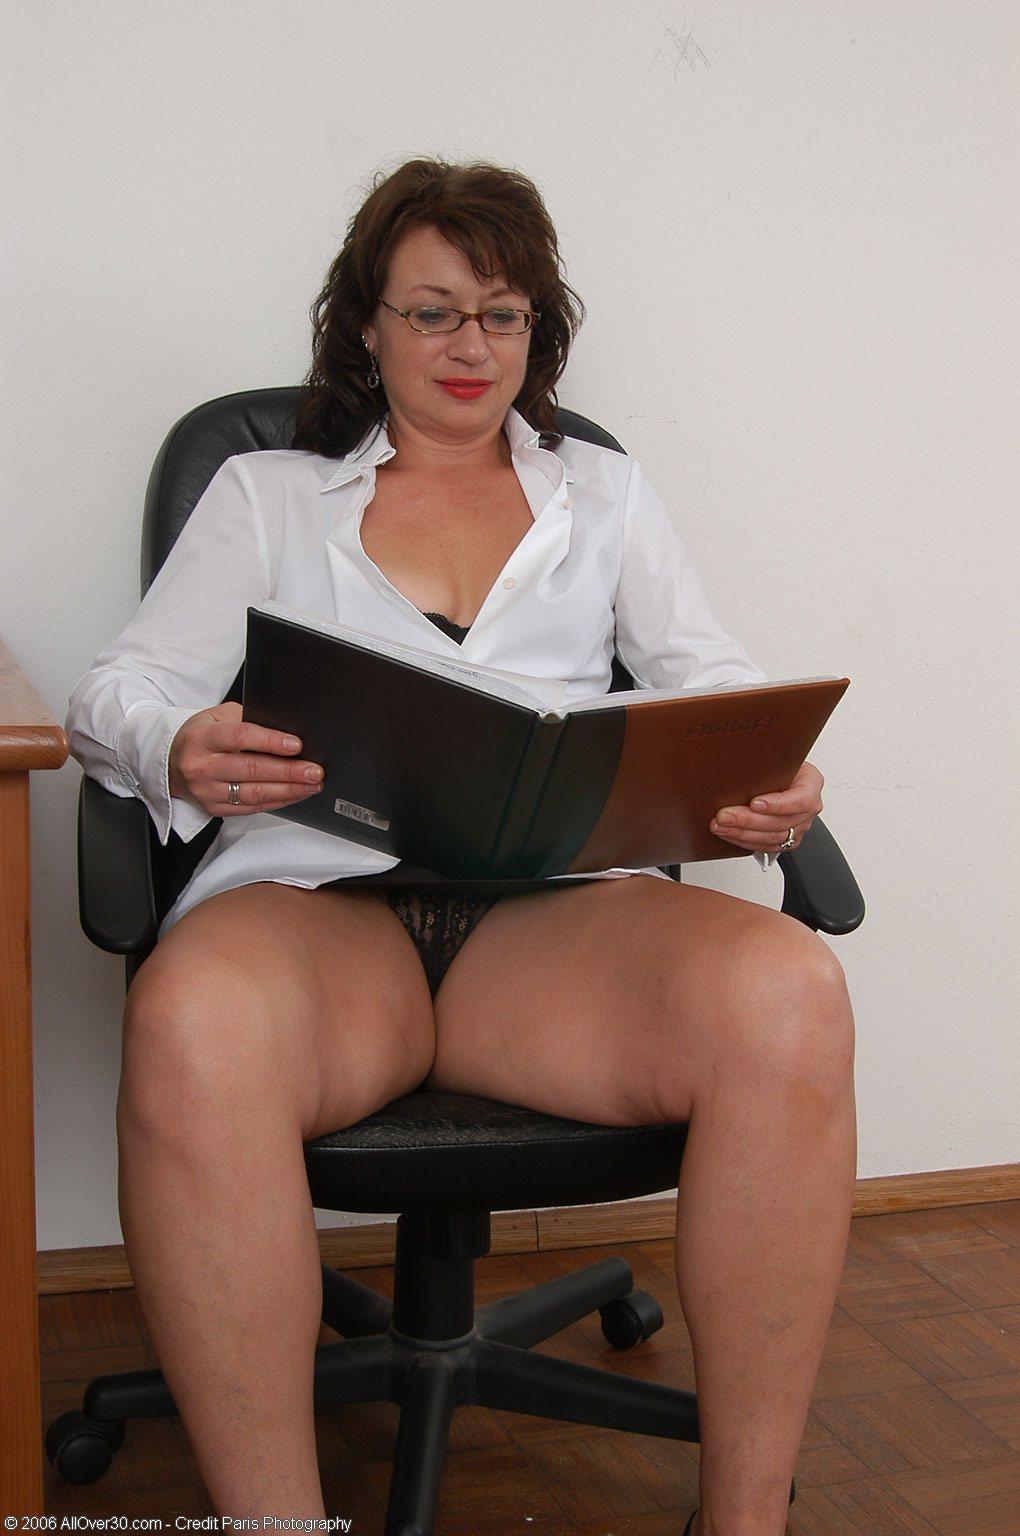 Секс юбке офисе 22 фотография